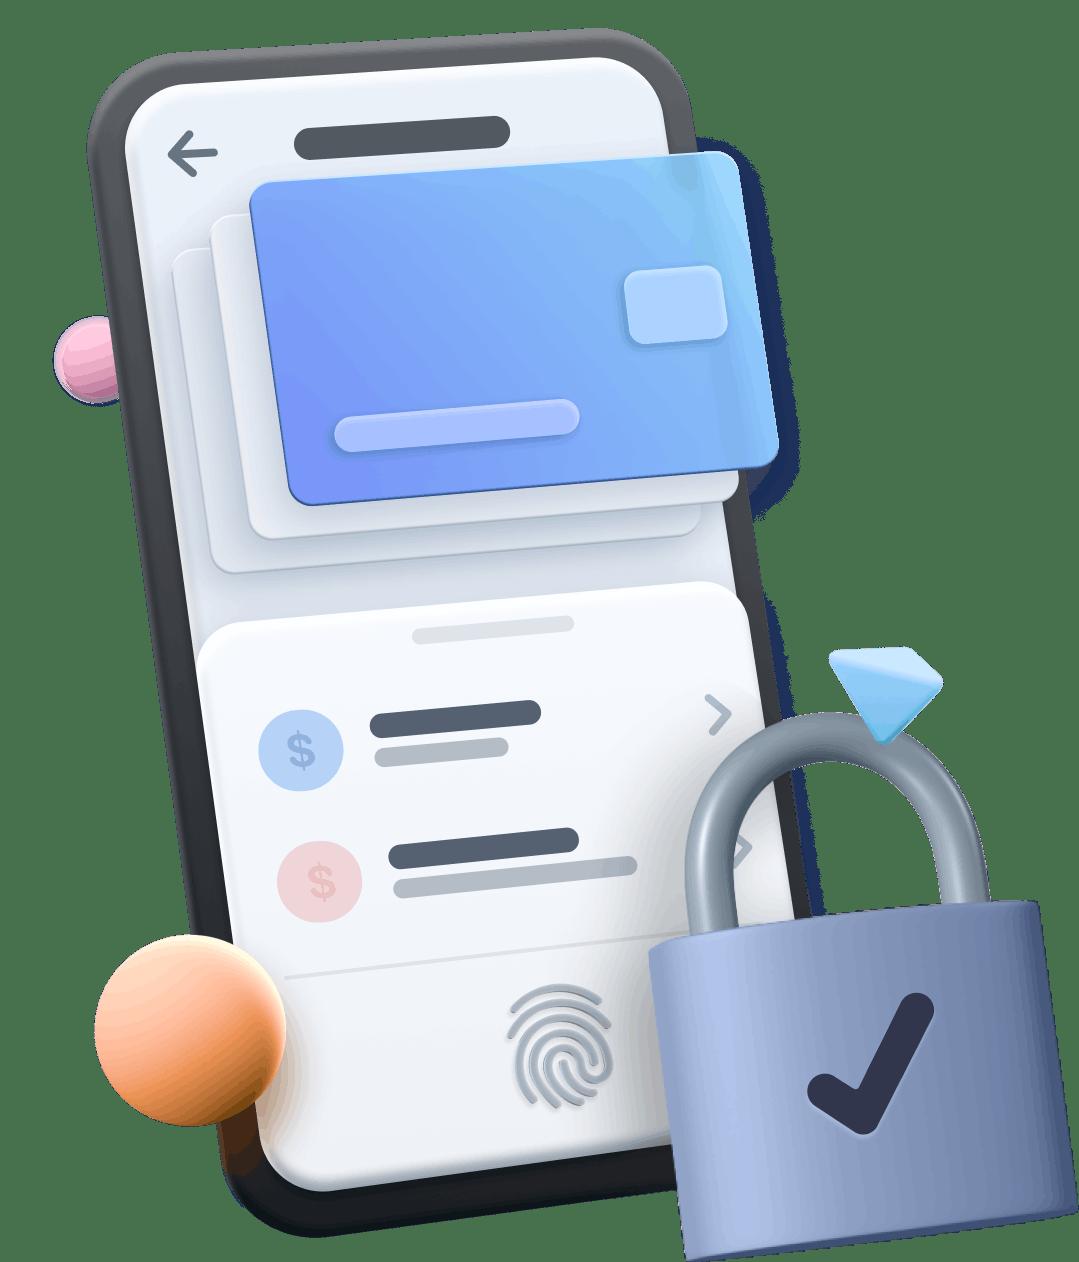 cartoon phone with lock